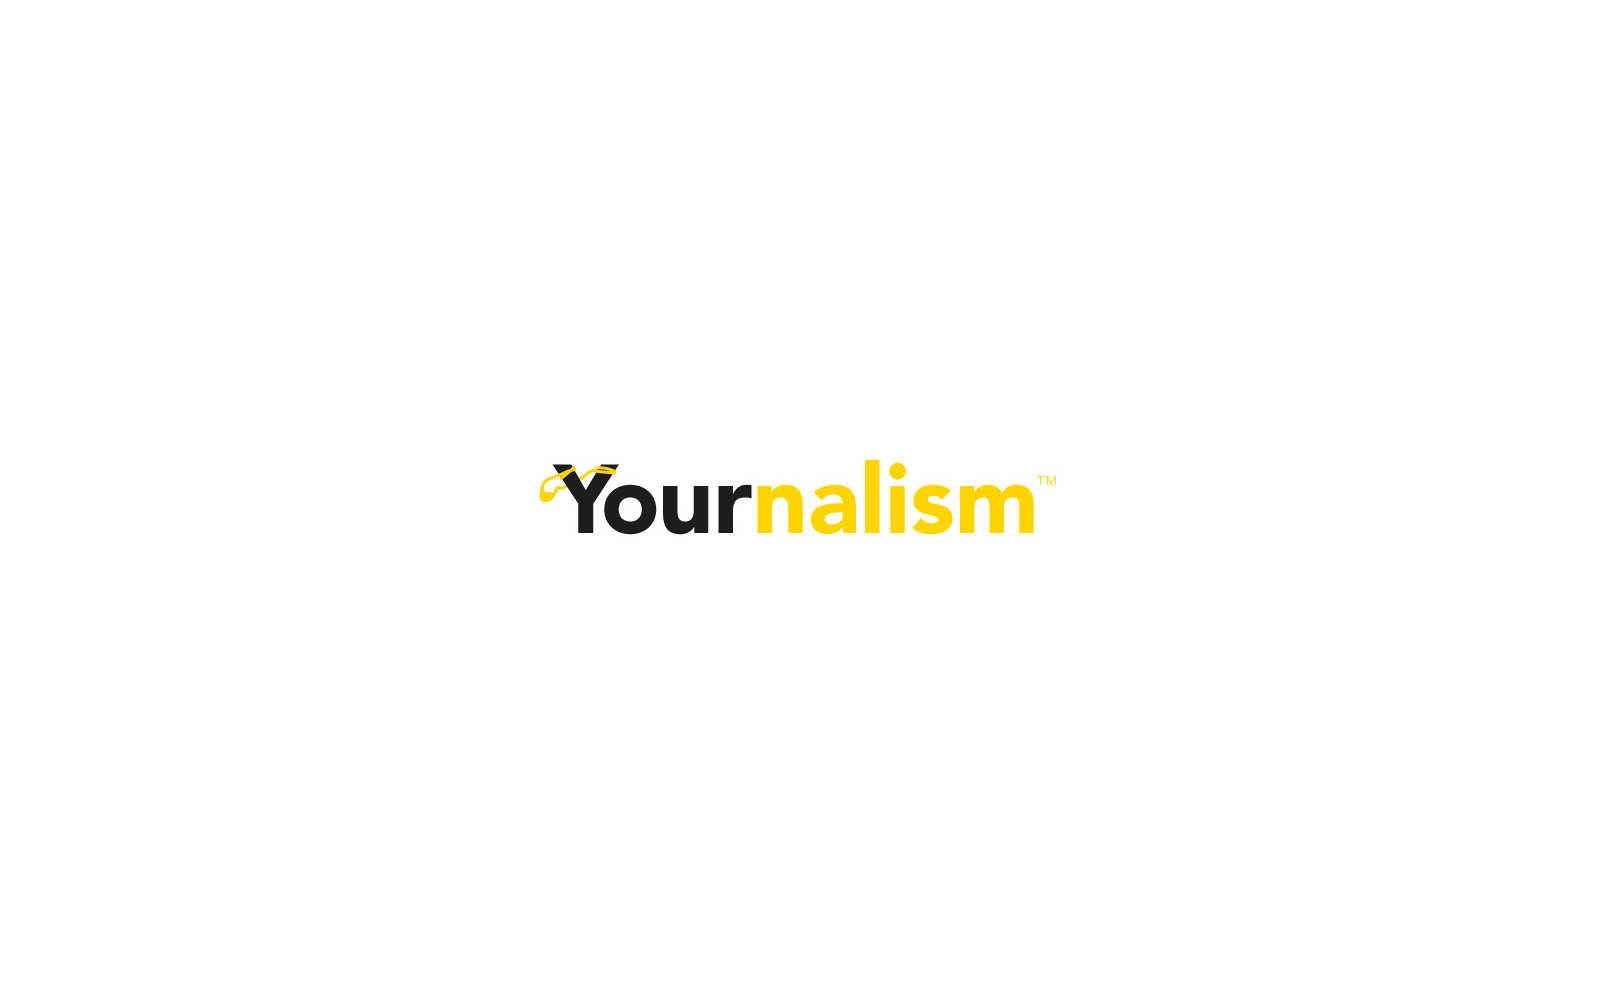 tumblr_static_yournalism_5